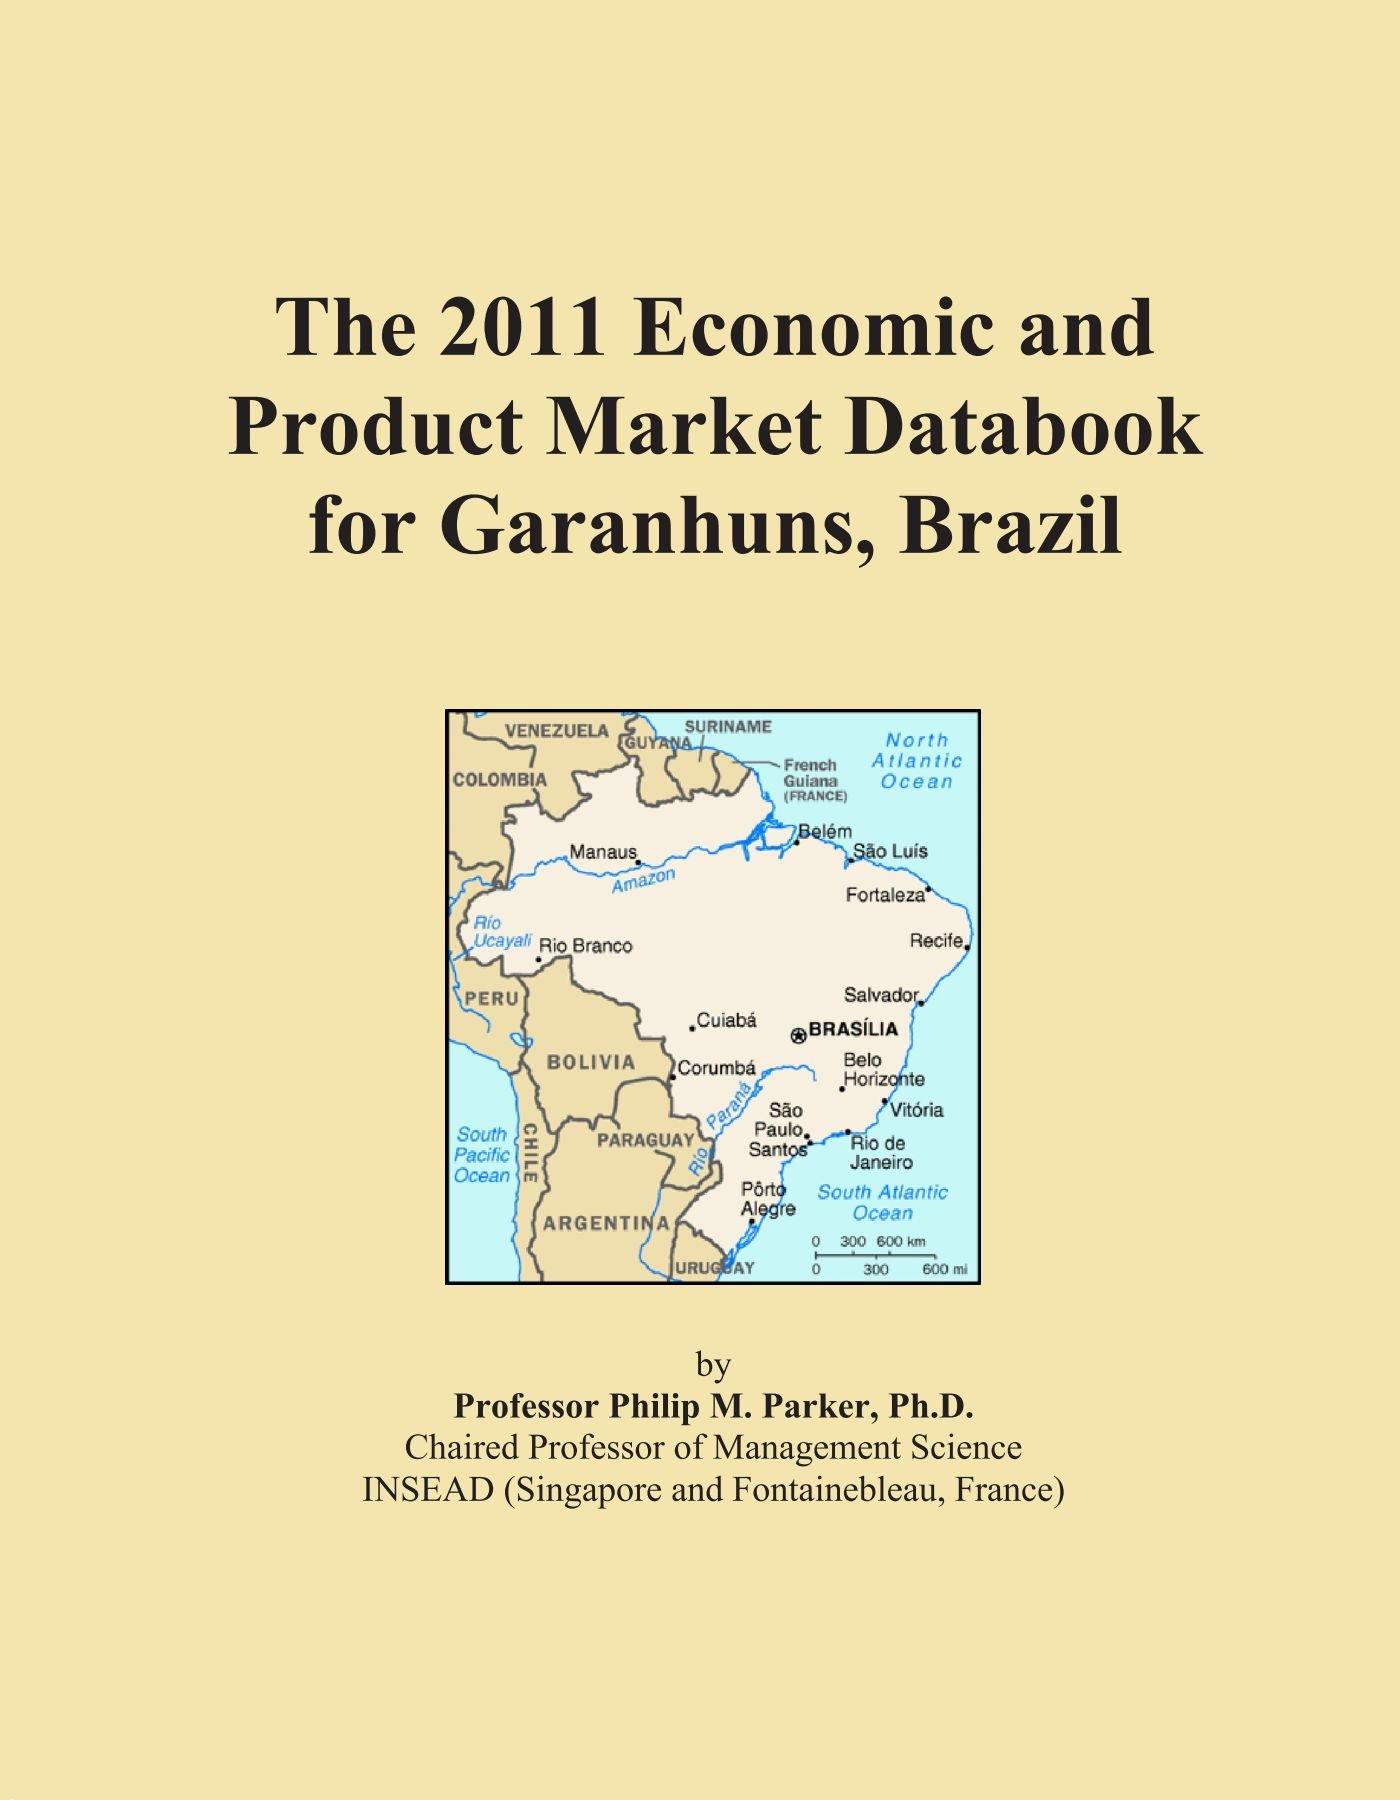 The 2011 Economic and Product Market Databook for Garanhuns, Brazil pdf